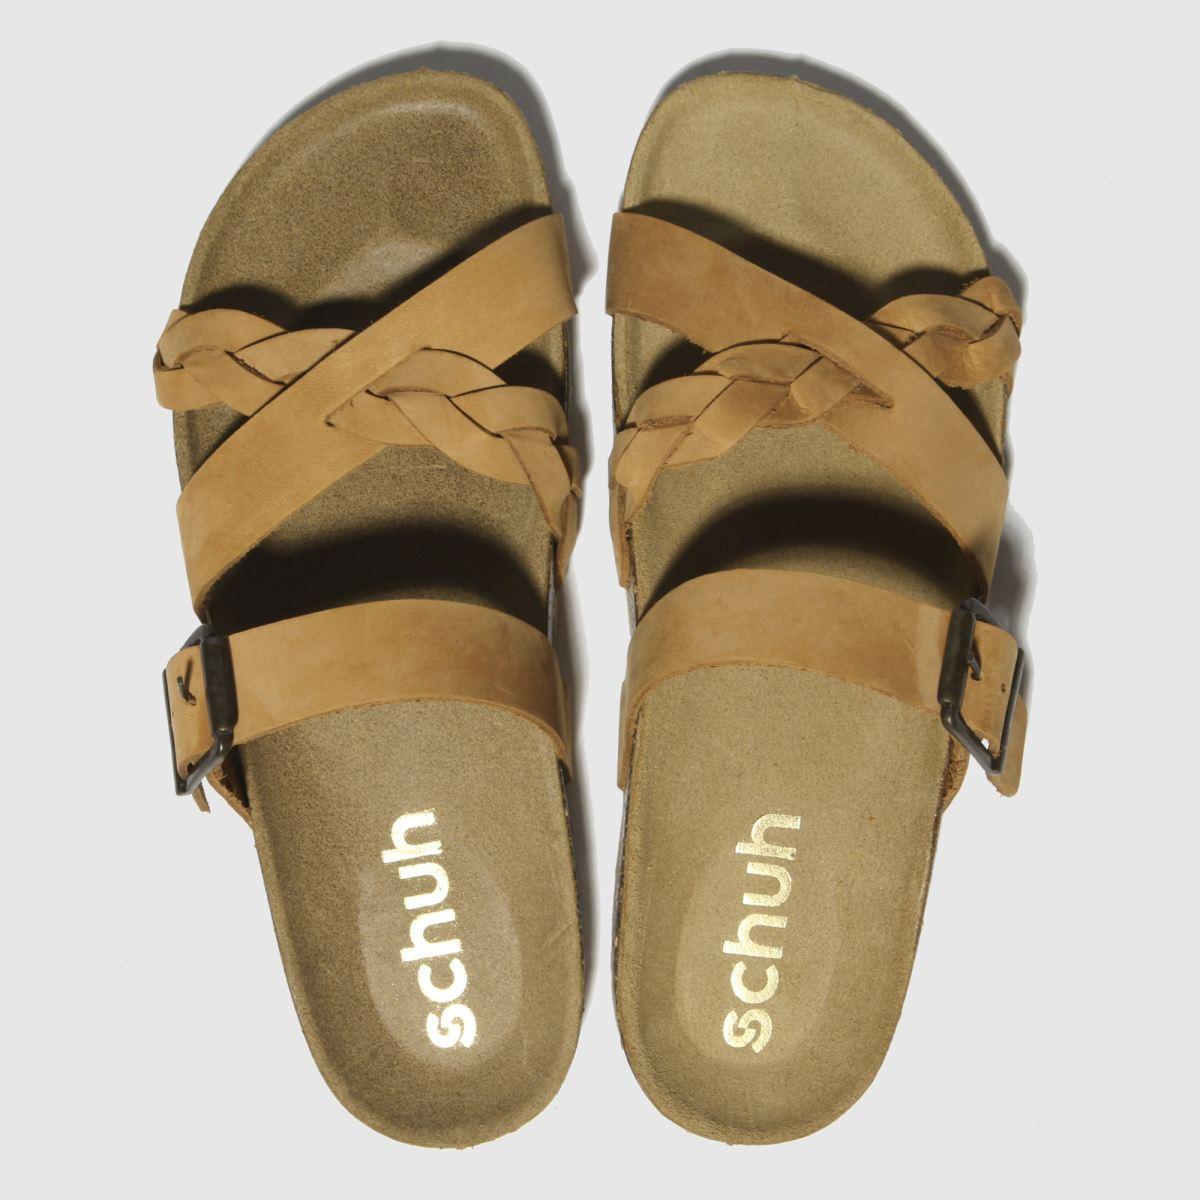 schuh Schuh Tan Astrology Sandals